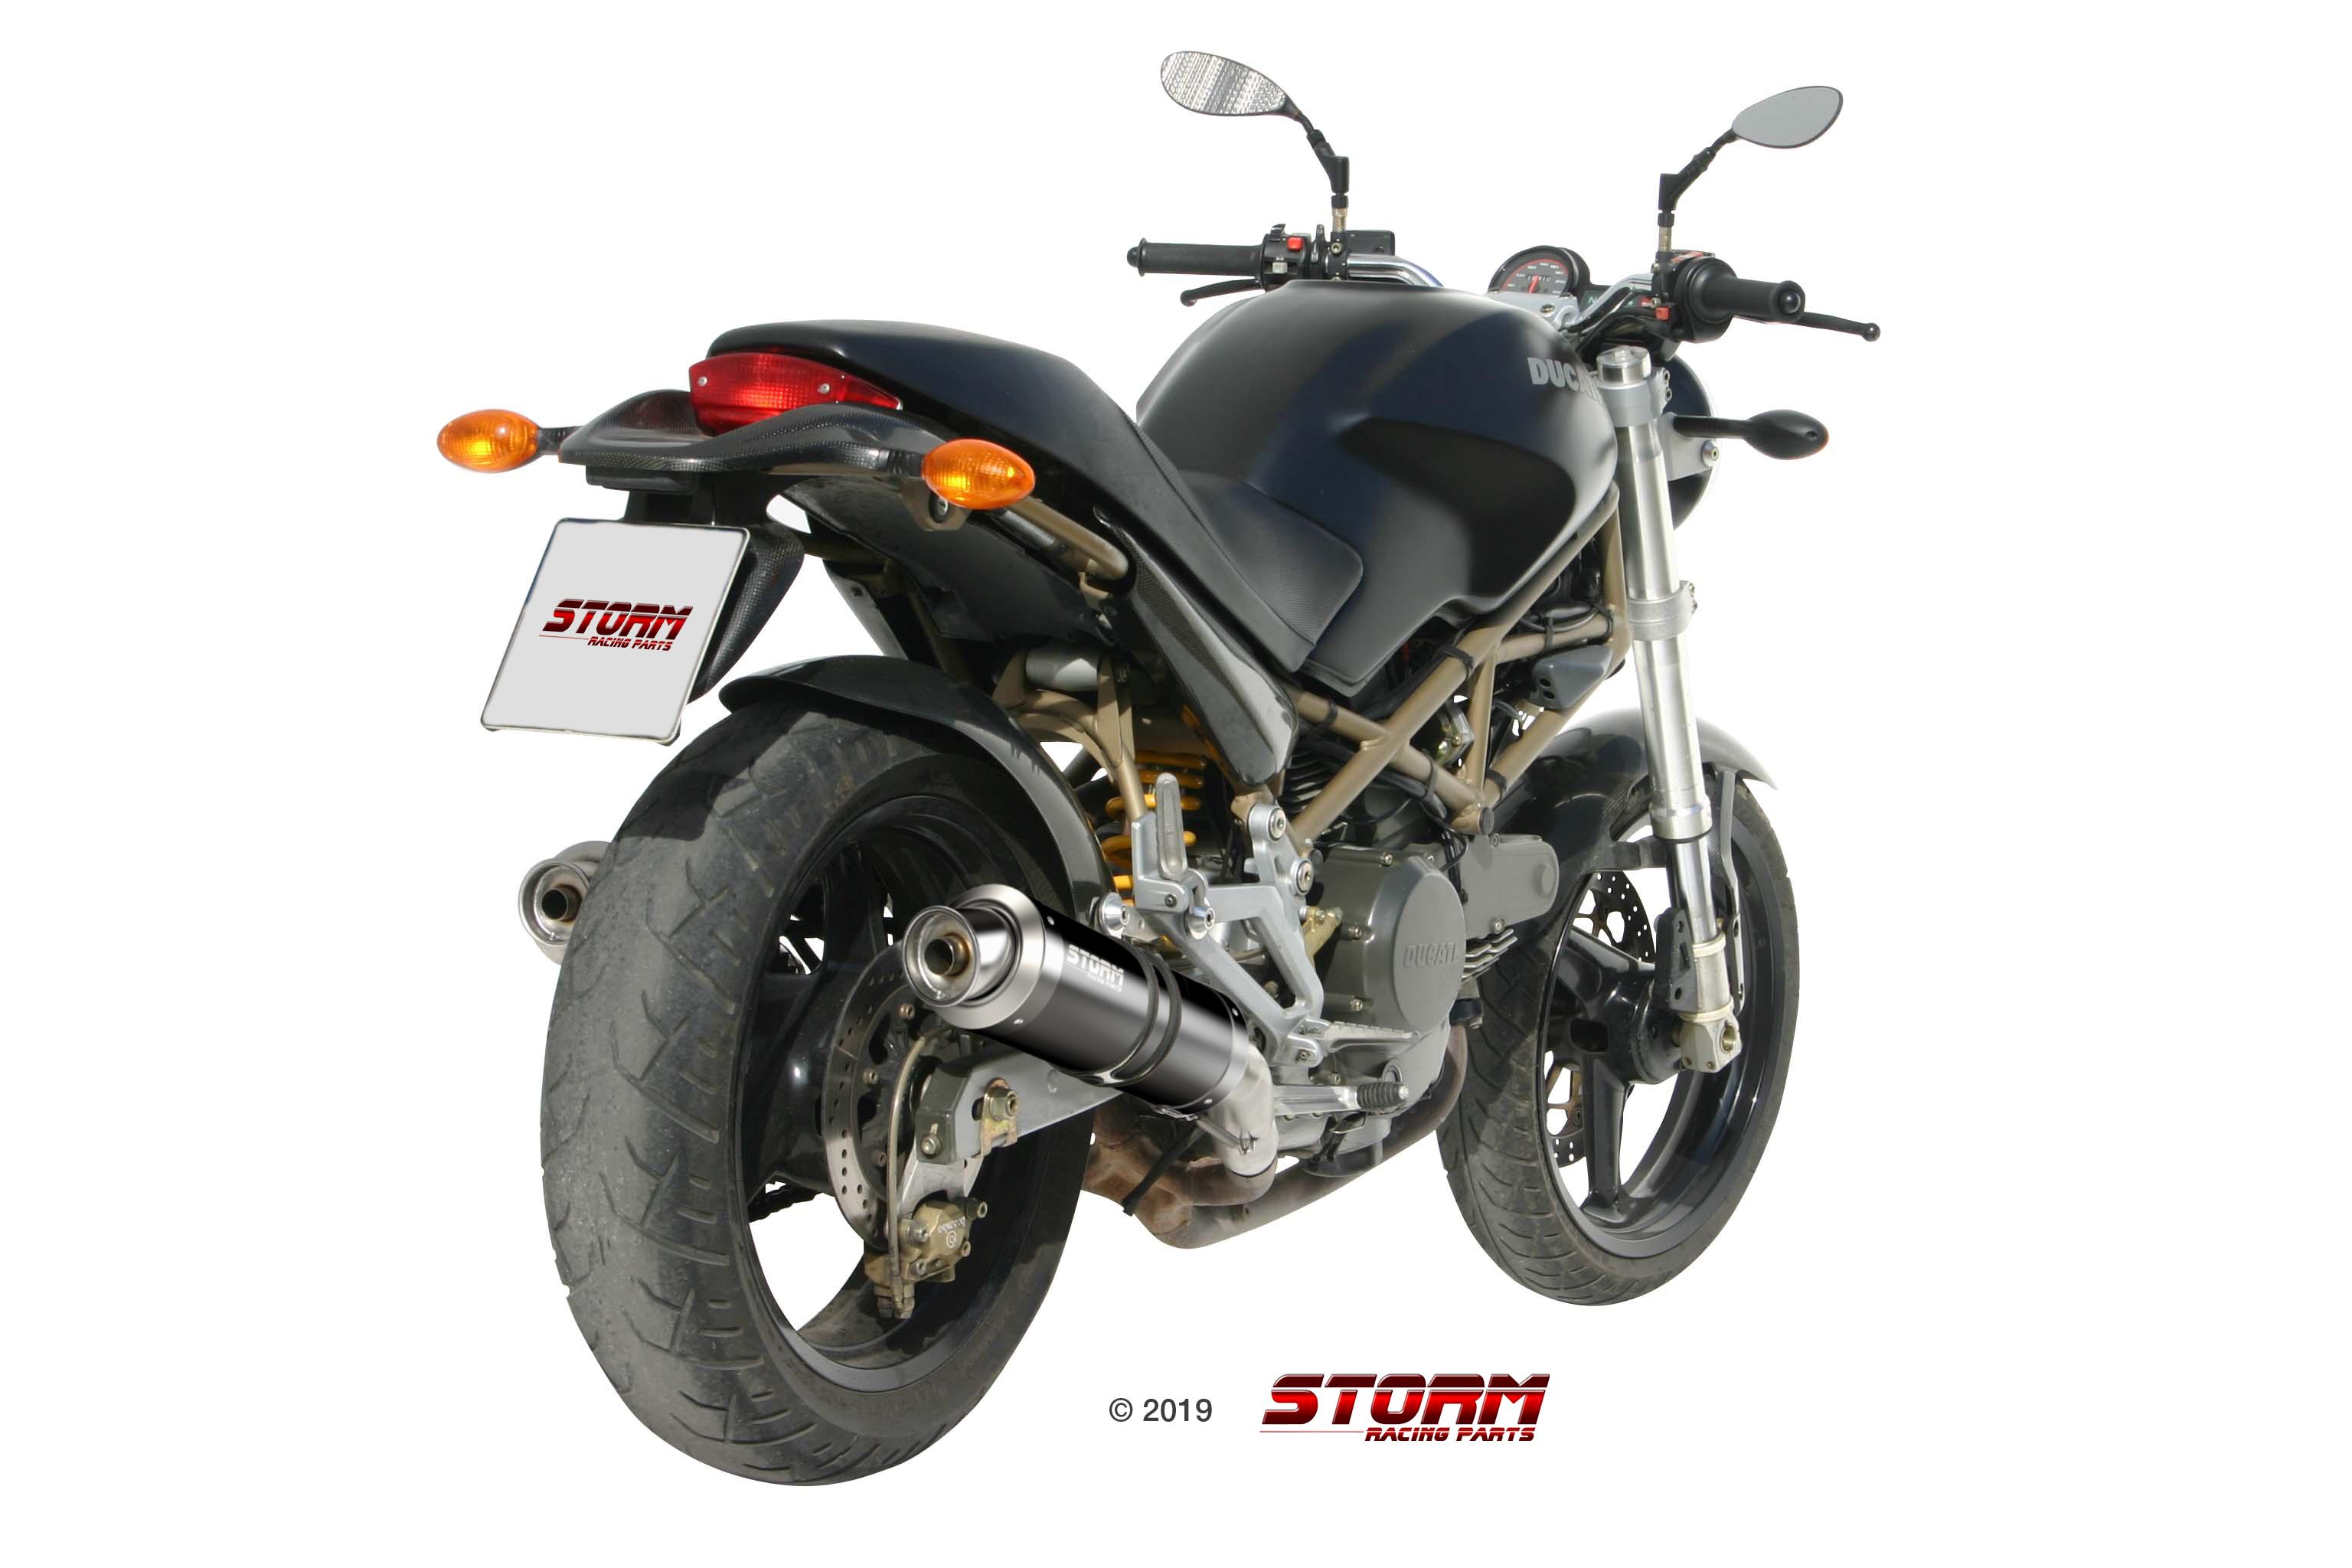 Scarico DUCATI MONSTER 600 Storm Gp Inox Nero D.016.LXSB